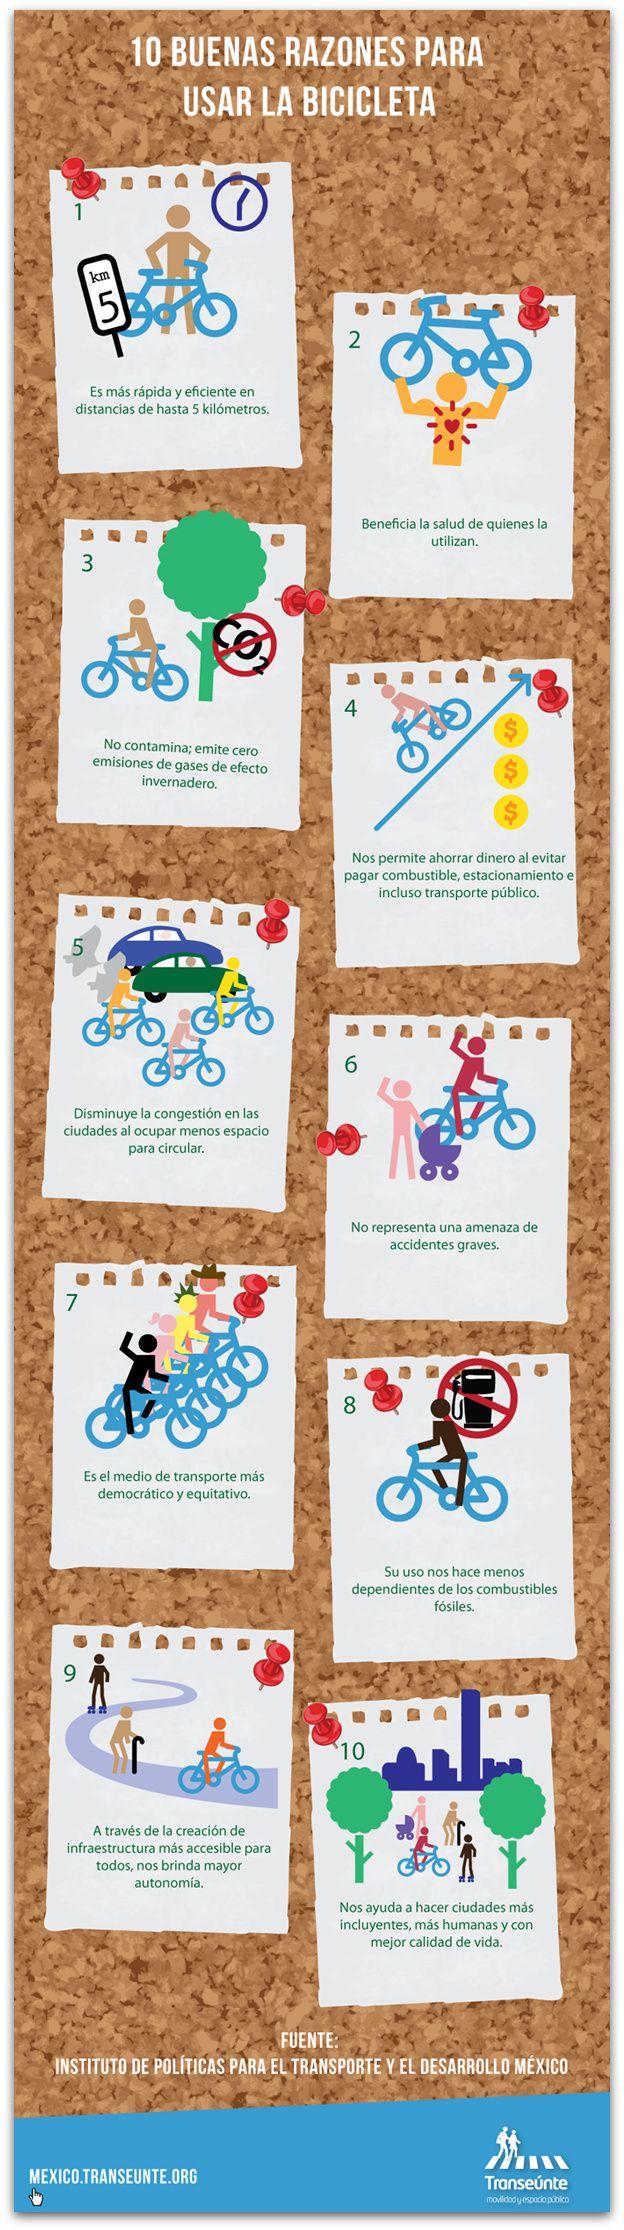 10 buenas razones para usar la bicicleta [infografia]